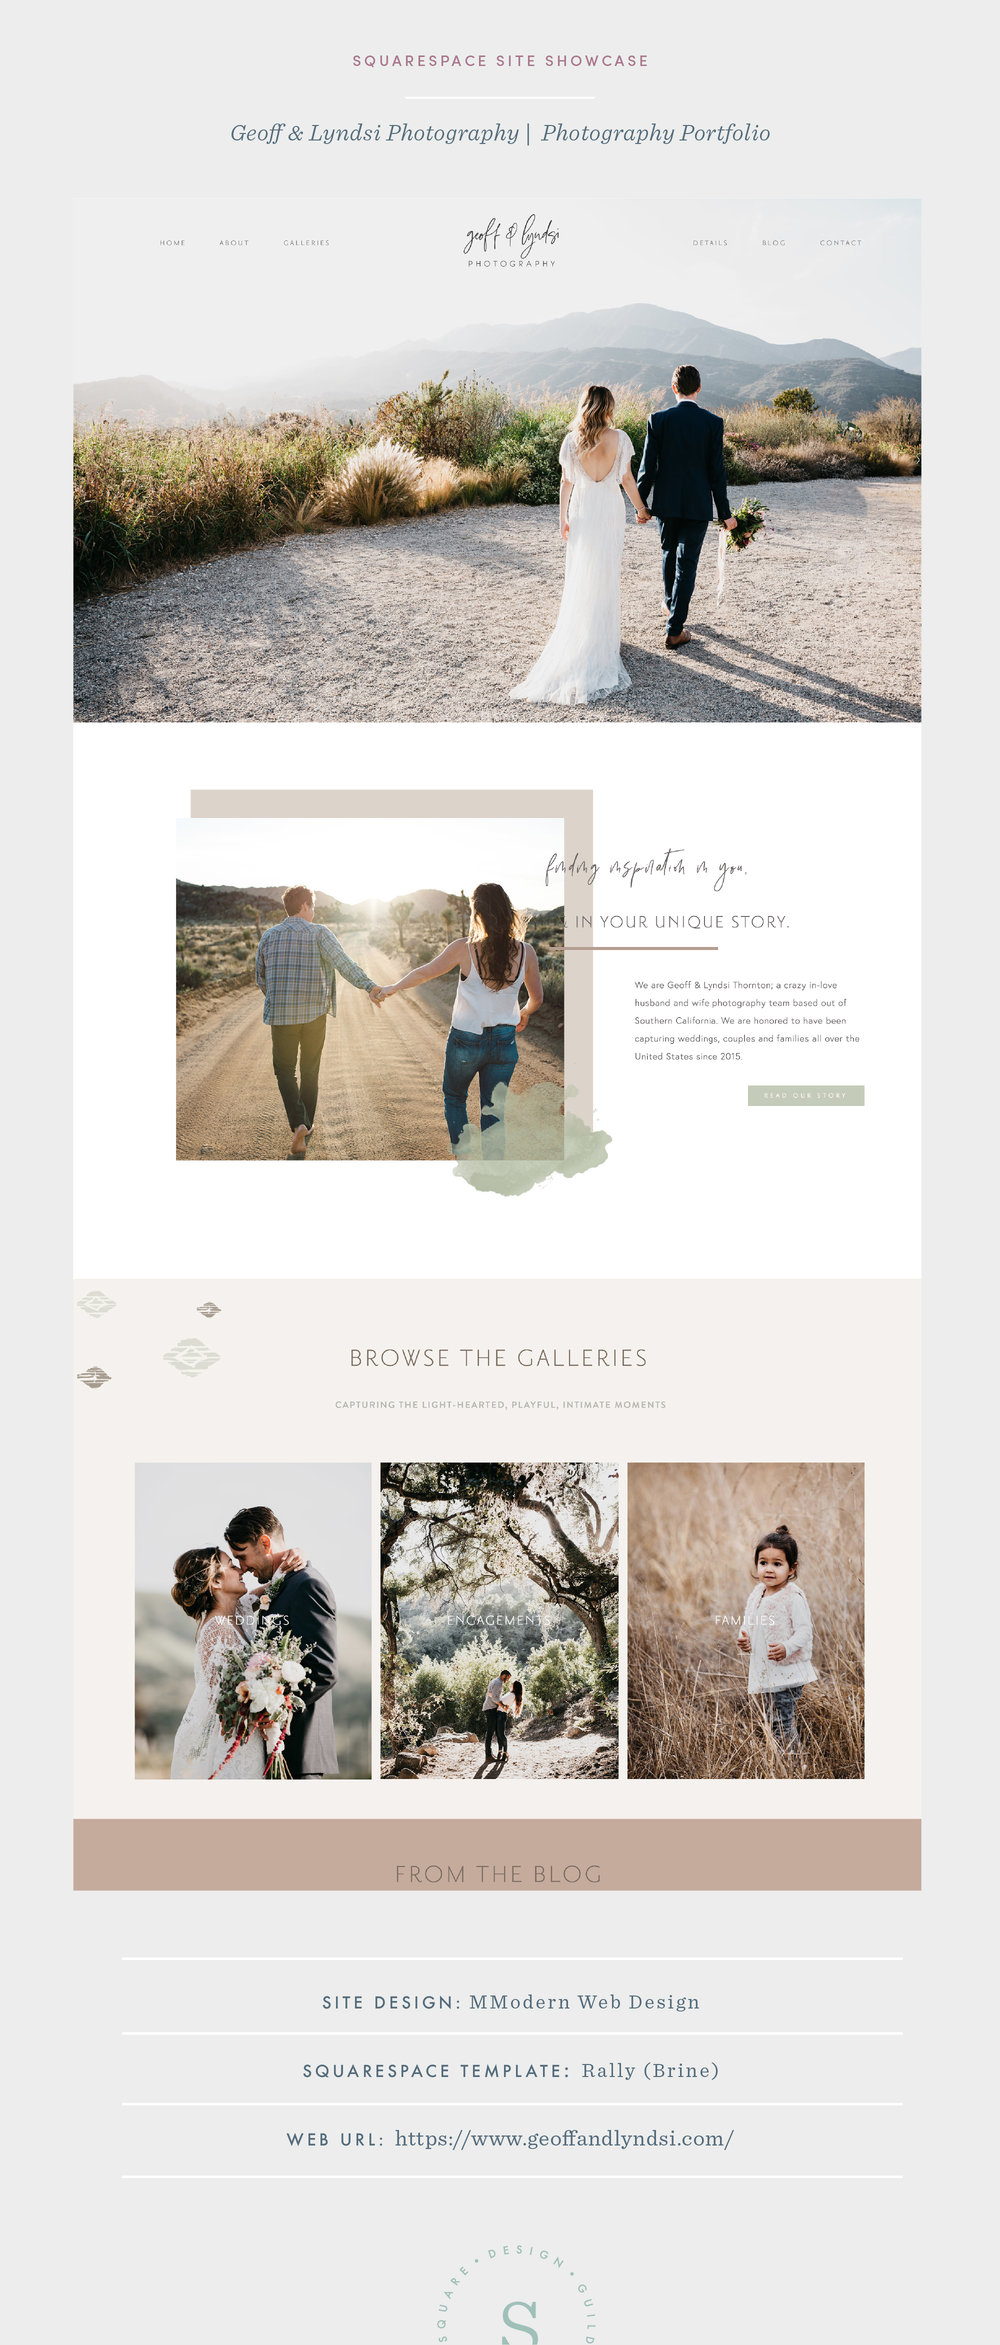 Geoff & Lyndsi PhotographySiteShowcase_FullPost.jpg